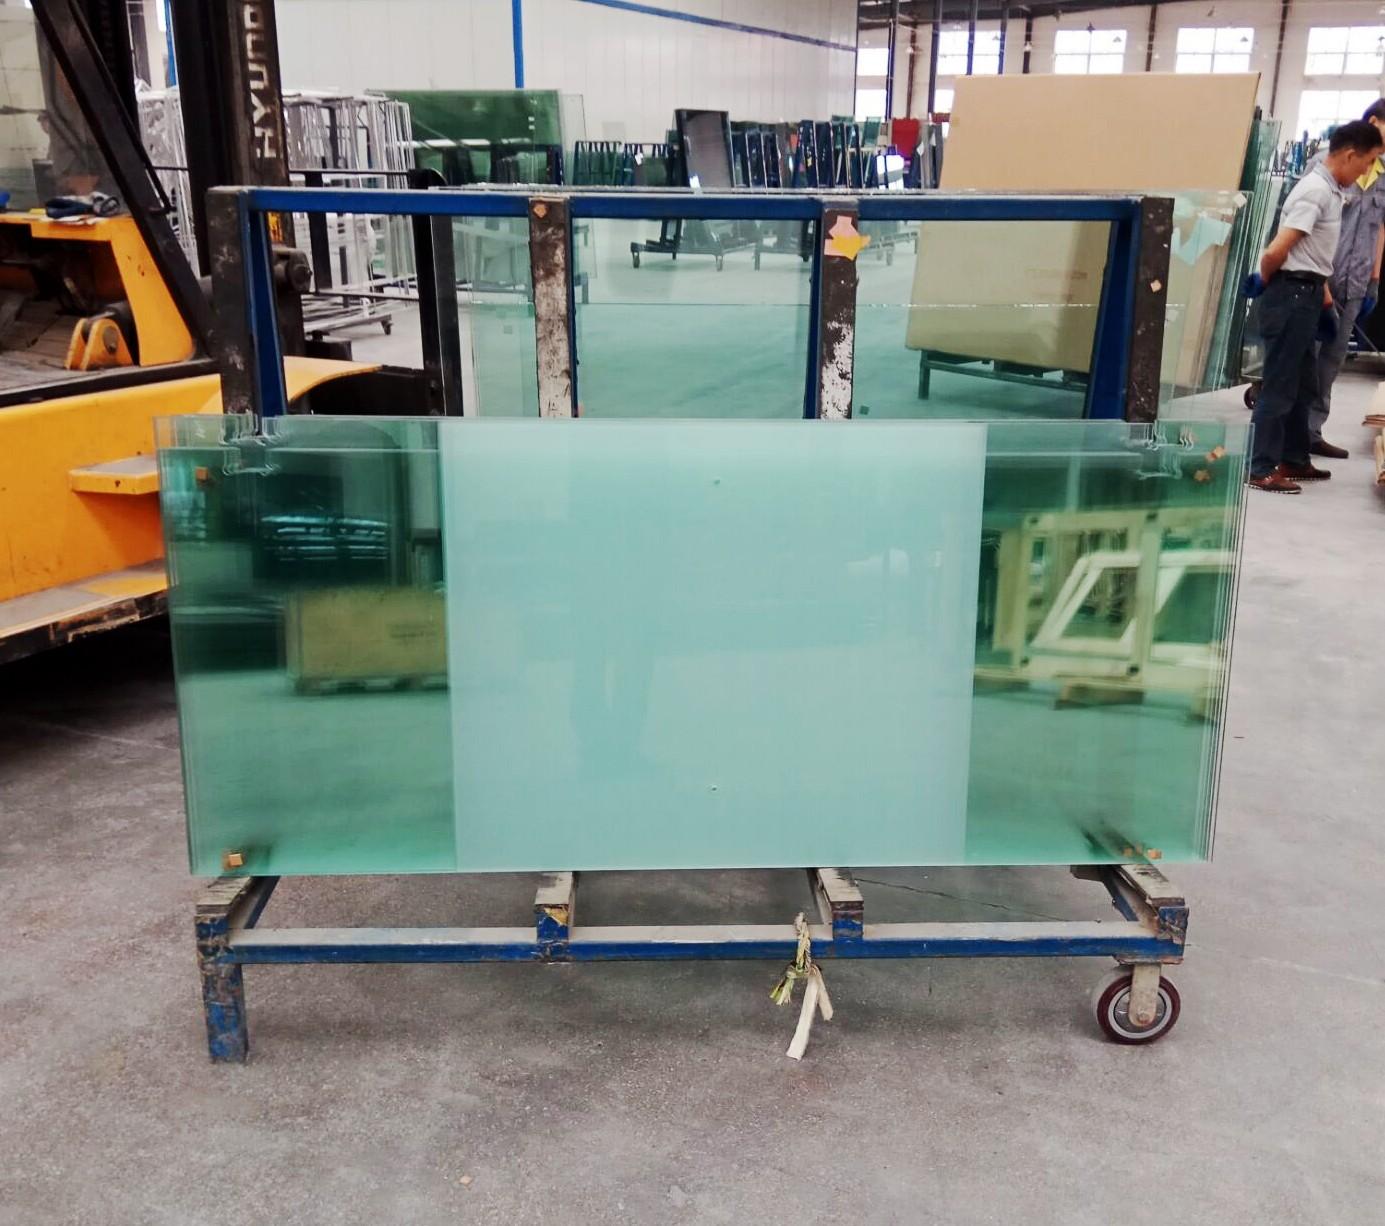 China glass in dubai wholesale 🇨🇳 - Alibaba